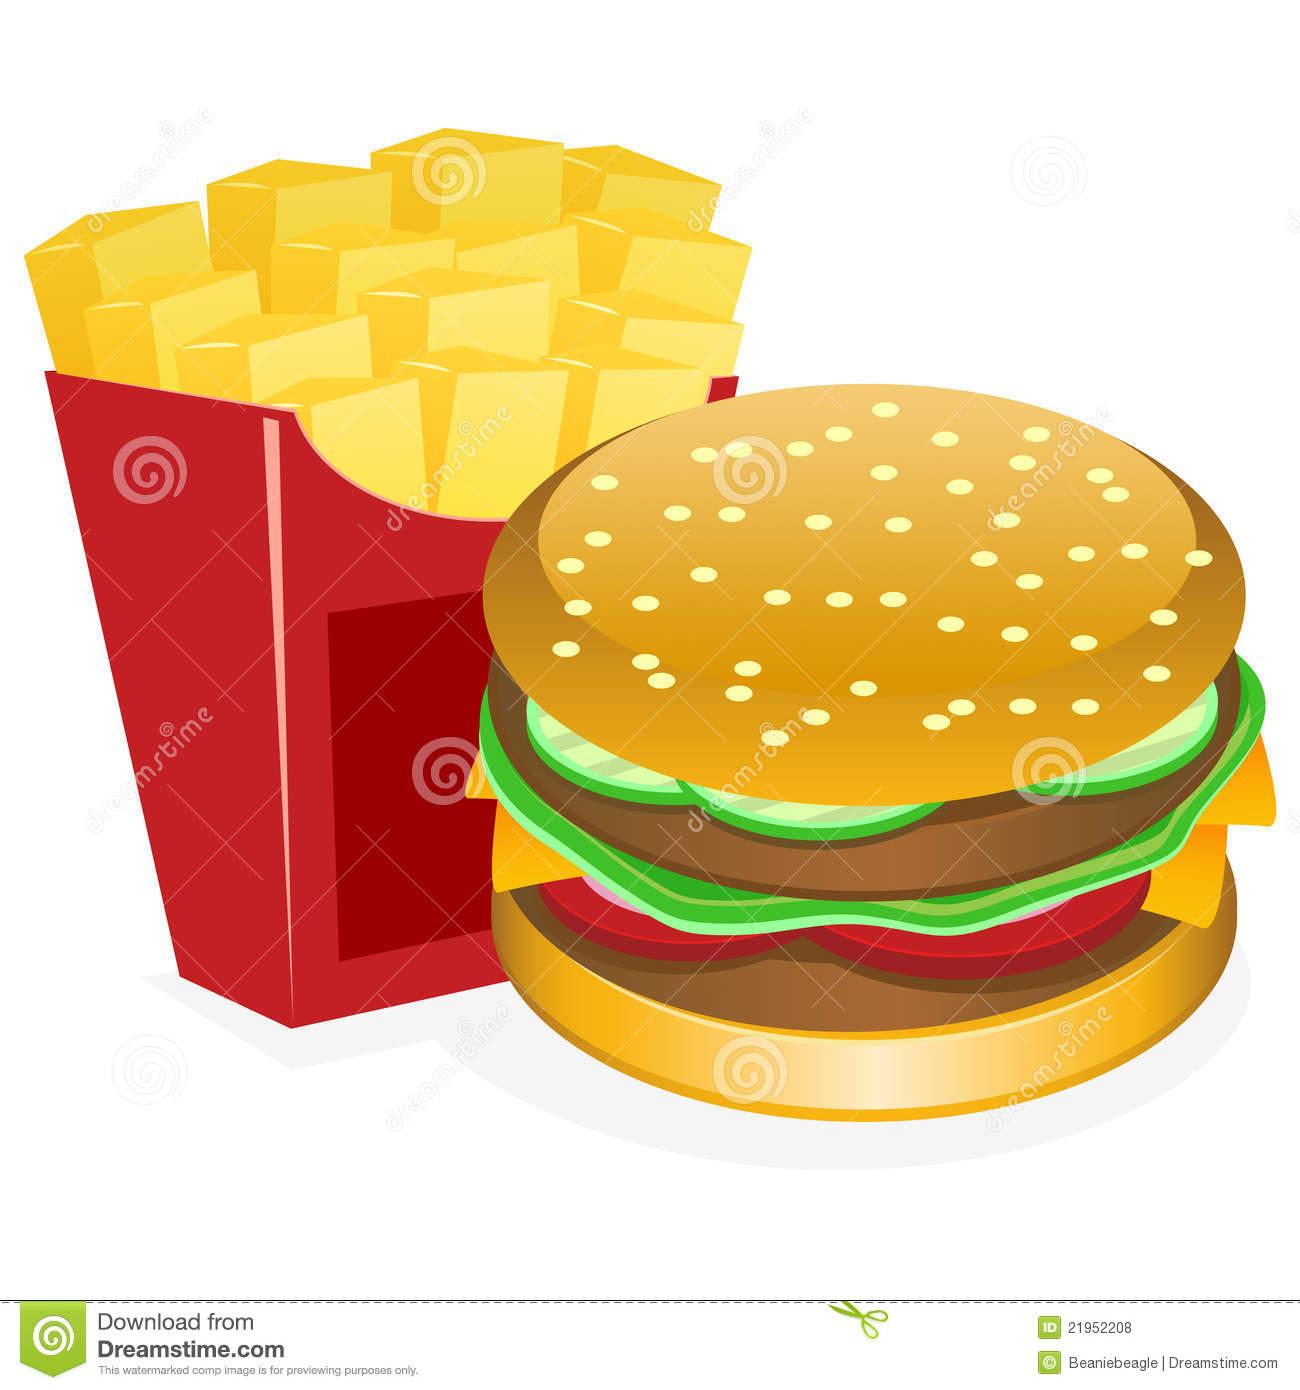 Hamburgers and fries clipart png Burger and fries clipart 6 » Clipart Station png